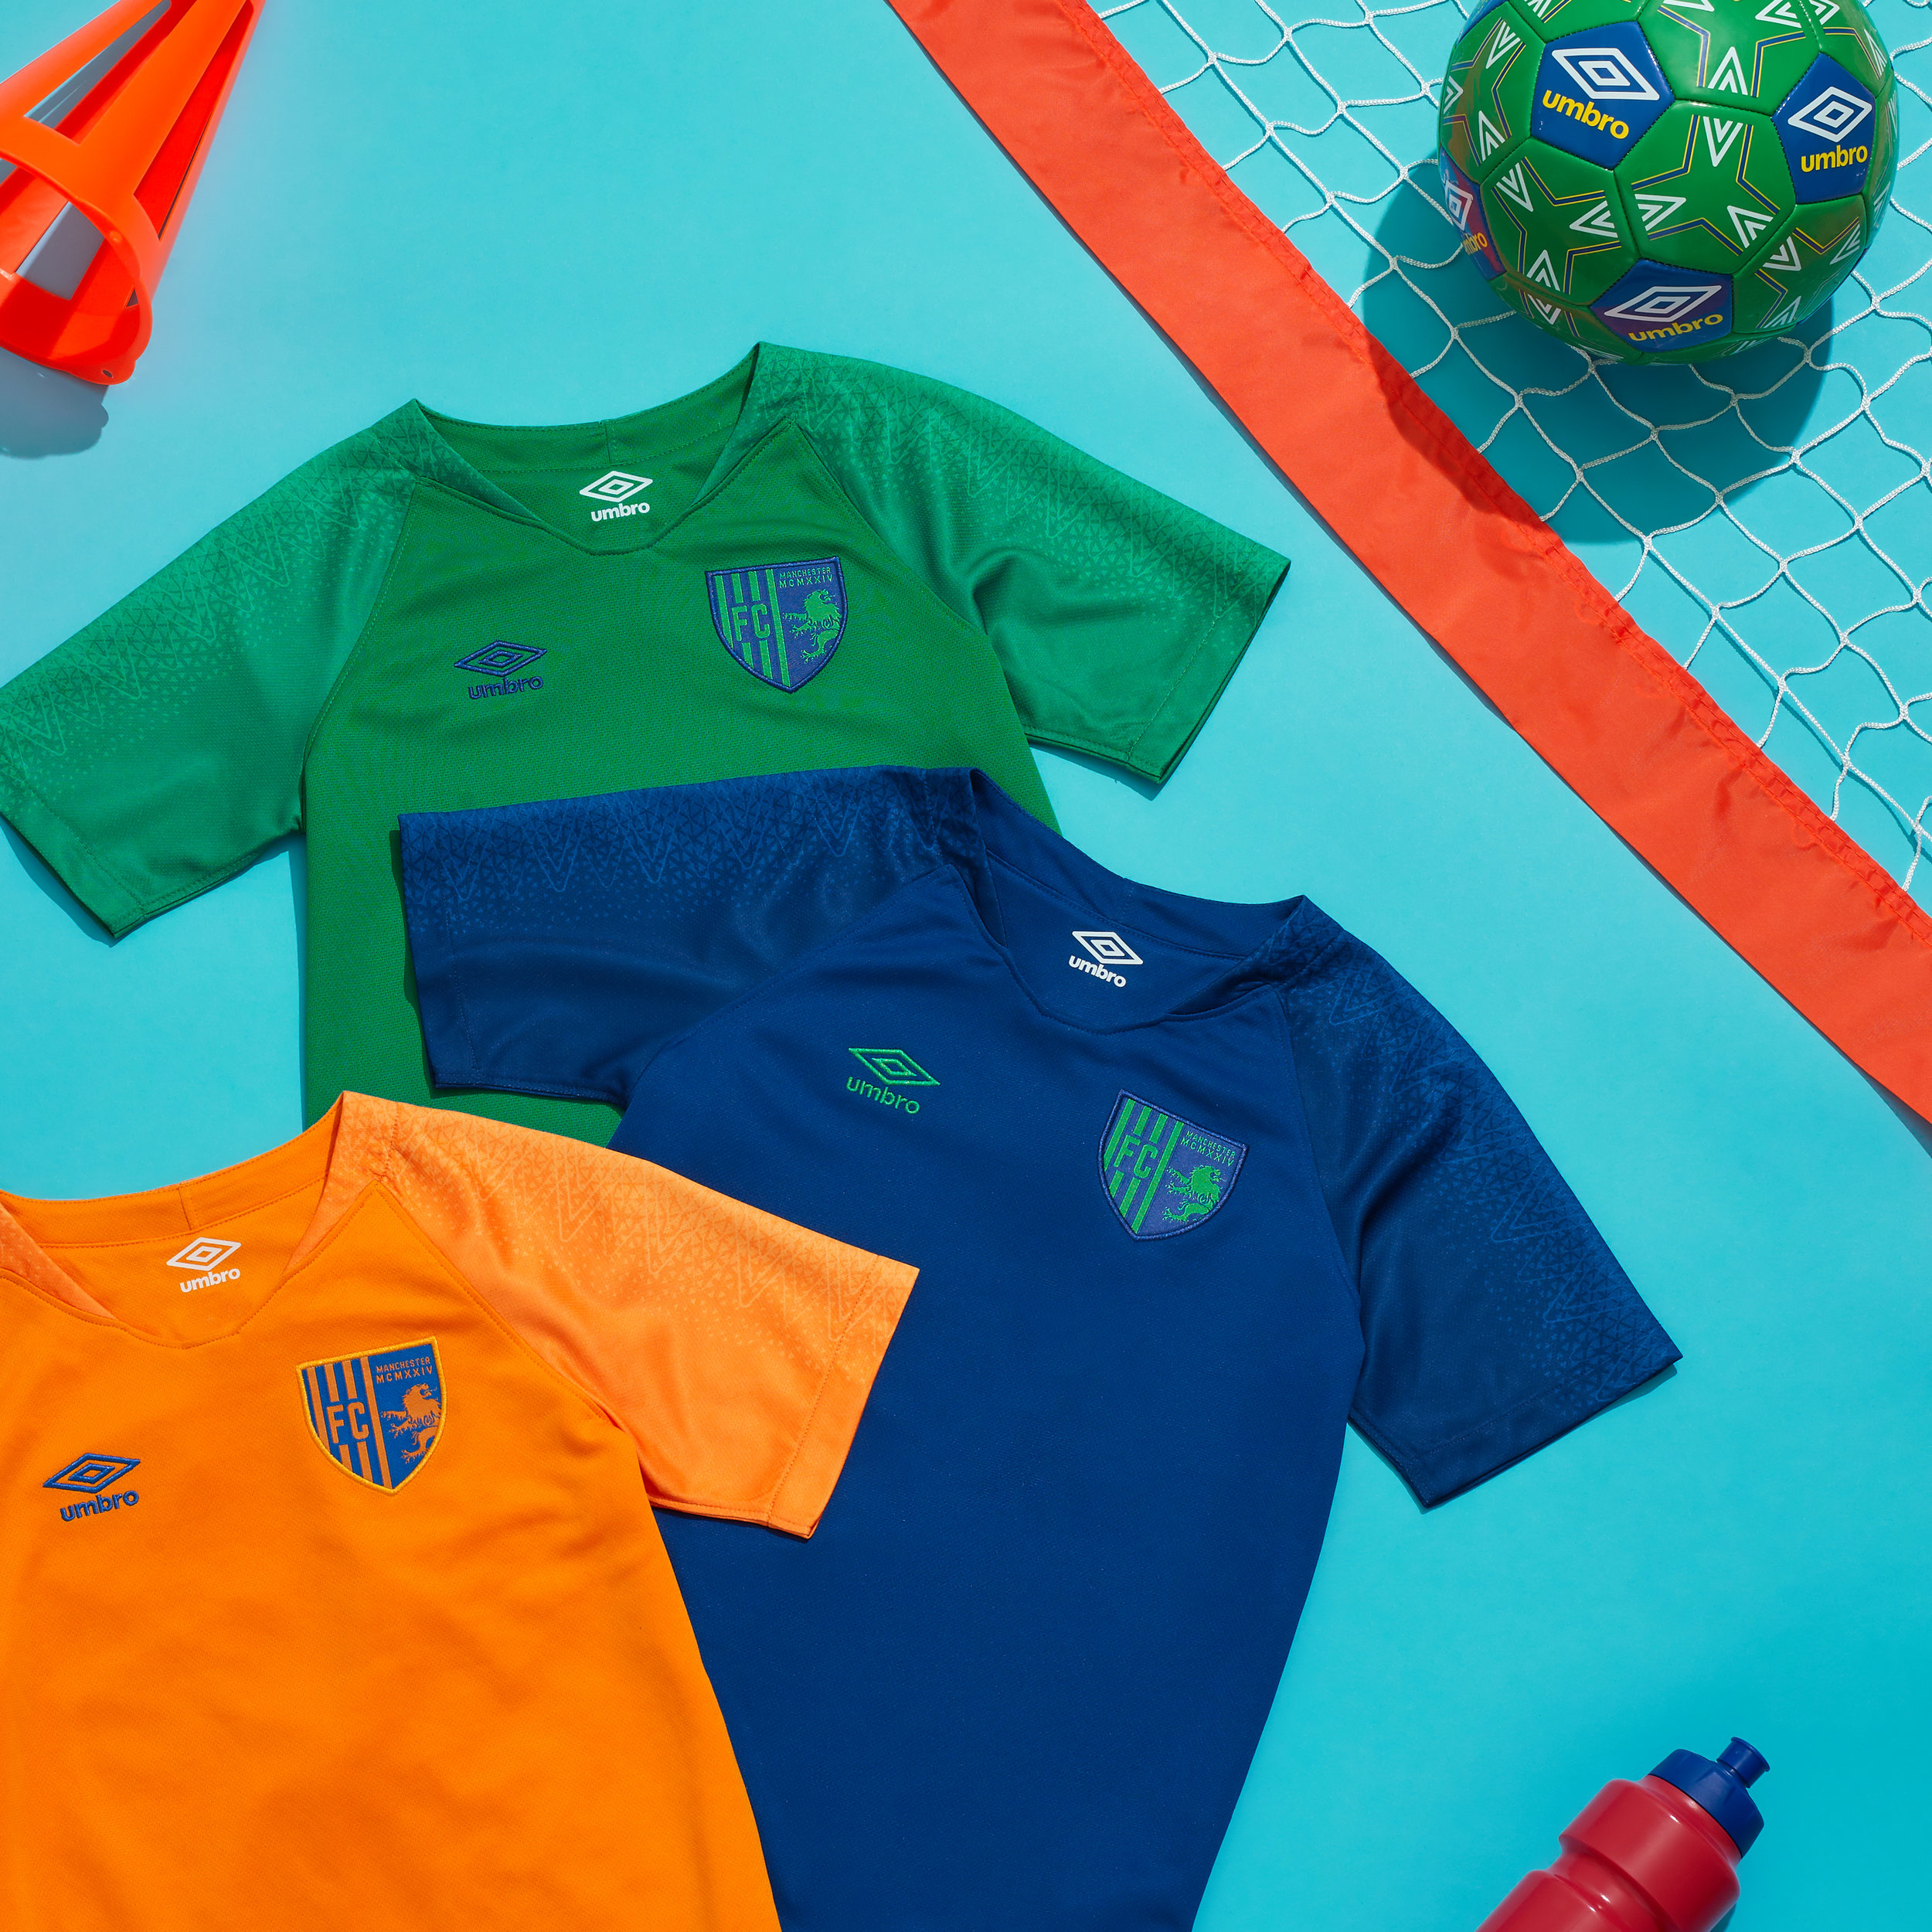 S19_BOYS_Target_SoccerJersey_179 copy.jpg